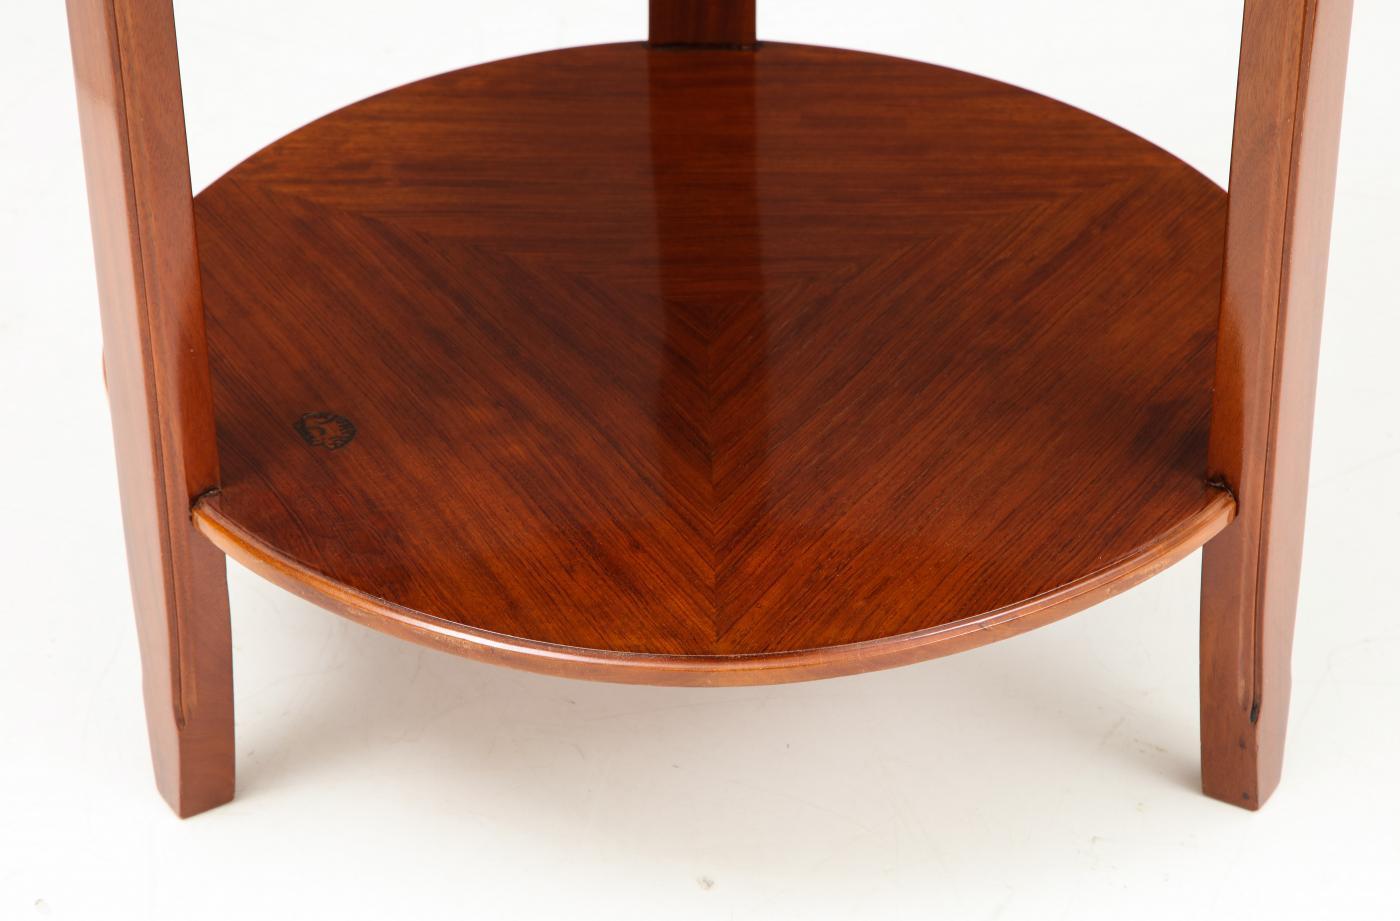 Art Deco side table by Louis Majorelle